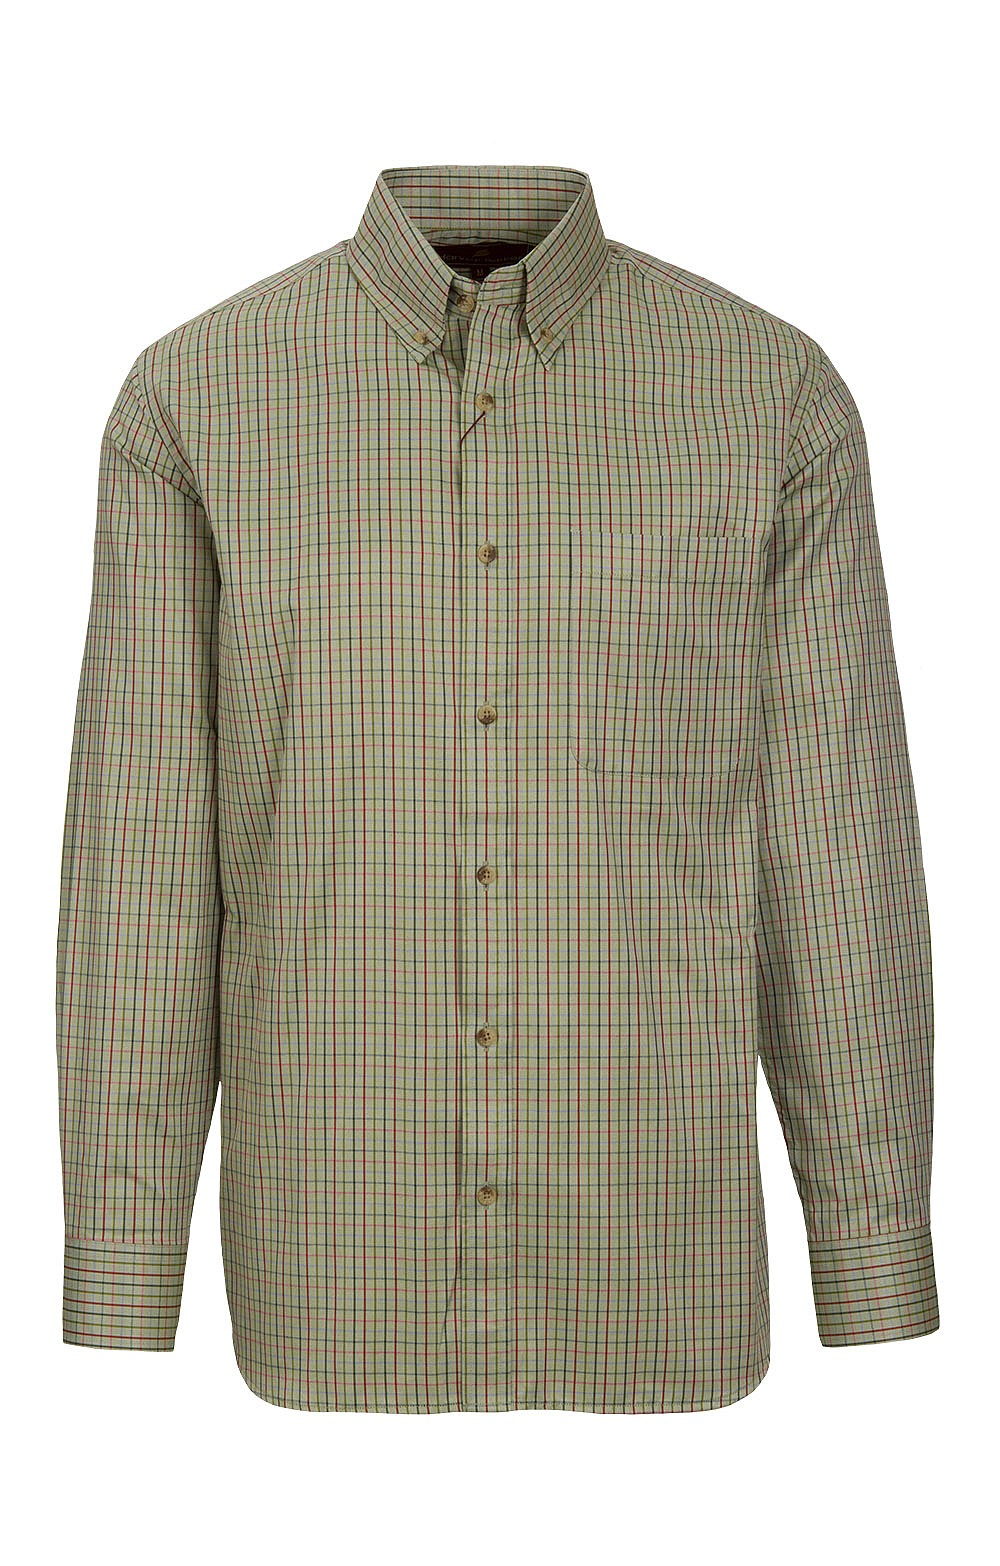 d3ecc033 Mens Country Check Shirt | Men's Tattersall Shirts | House Of Bruar